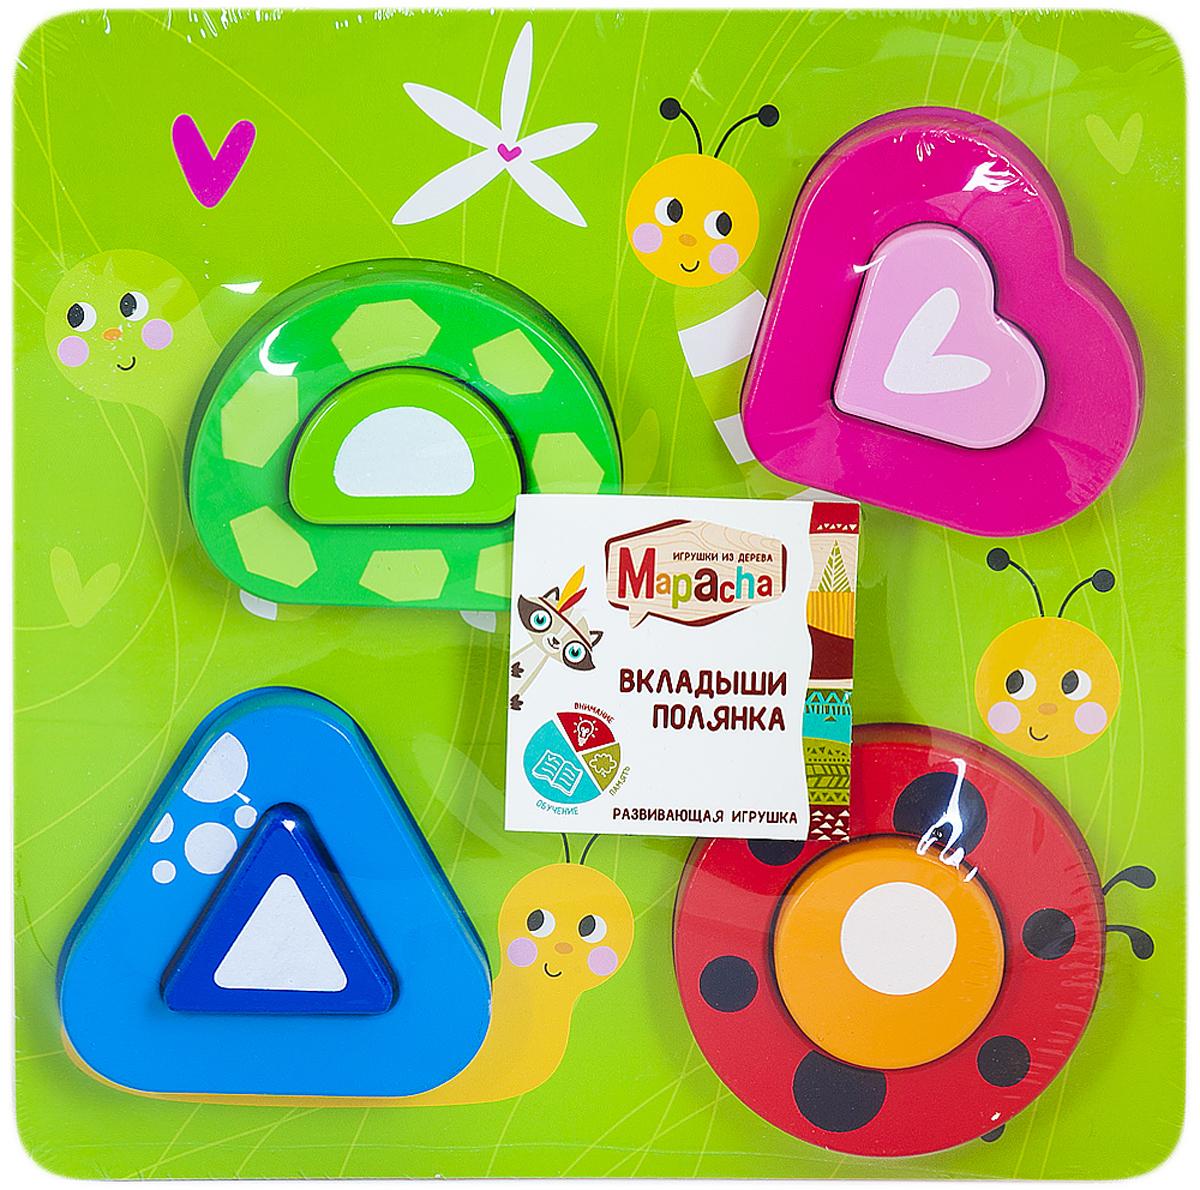 Mapacha Пазл для малышей Вкладыши Полянка mapacha пазл для малышей вкладыши формы и цвета